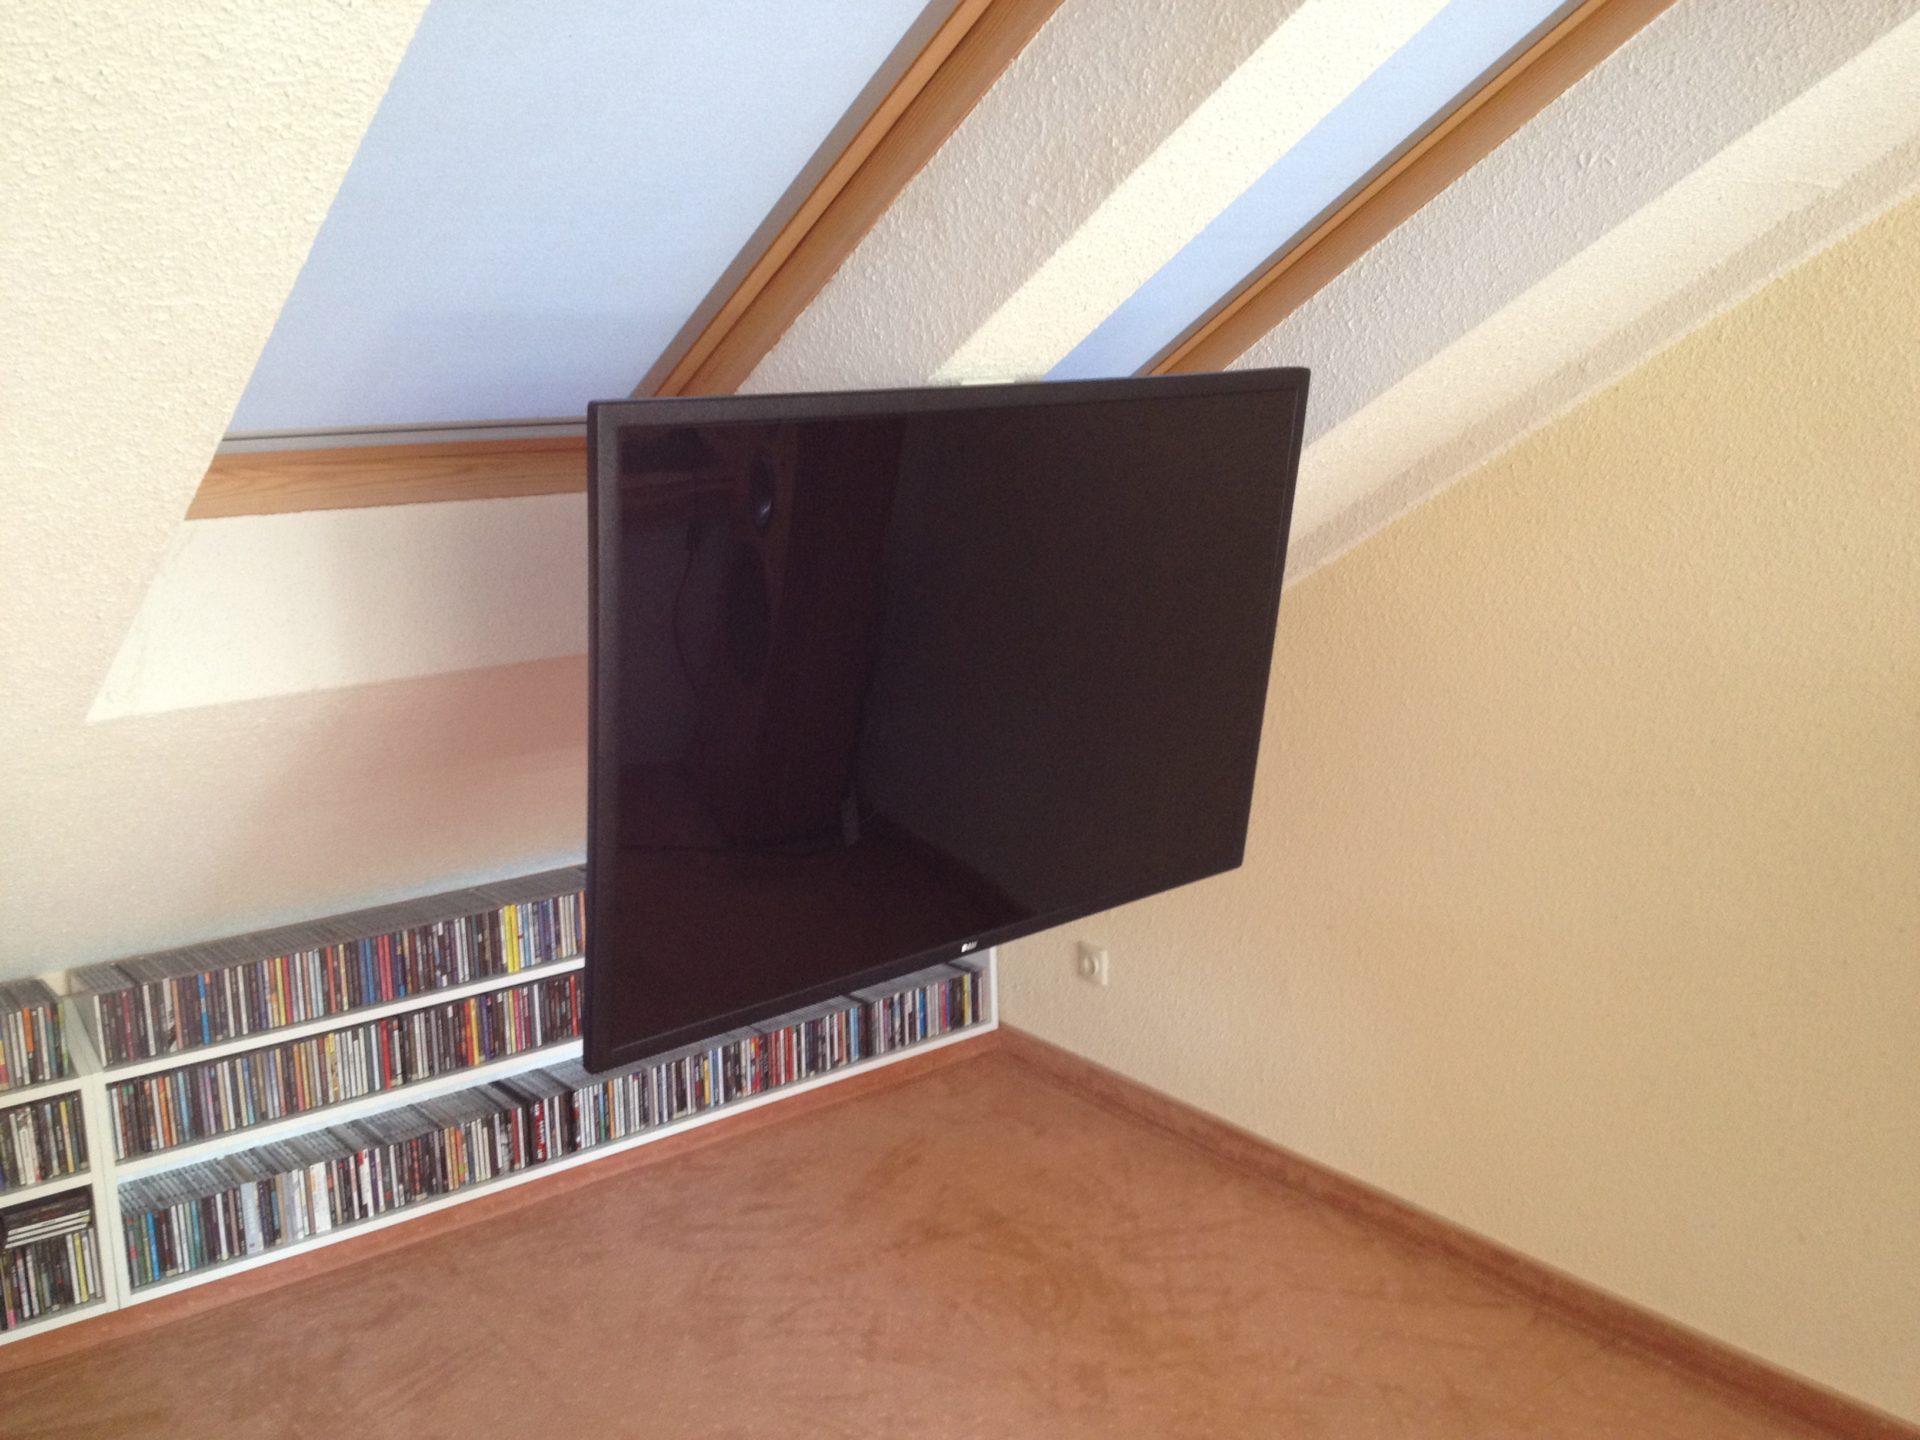 Tv Mounts For Sloped Ceilings Sigden